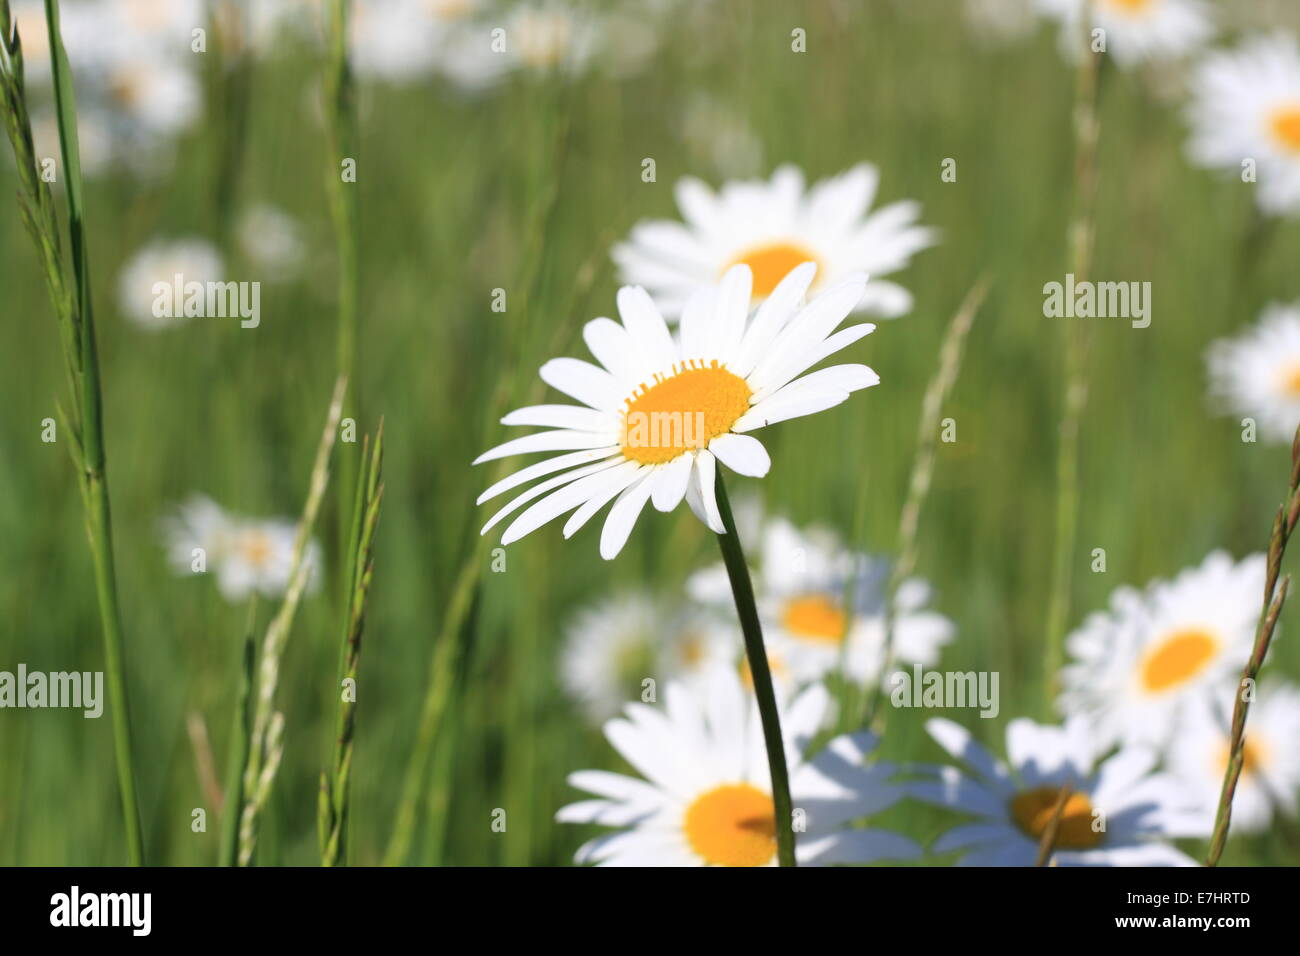 Beautiful daisy flowers on a green meadow stock photo royalty free beautiful daisy flowers on a green meadow izmirmasajfo Choice Image